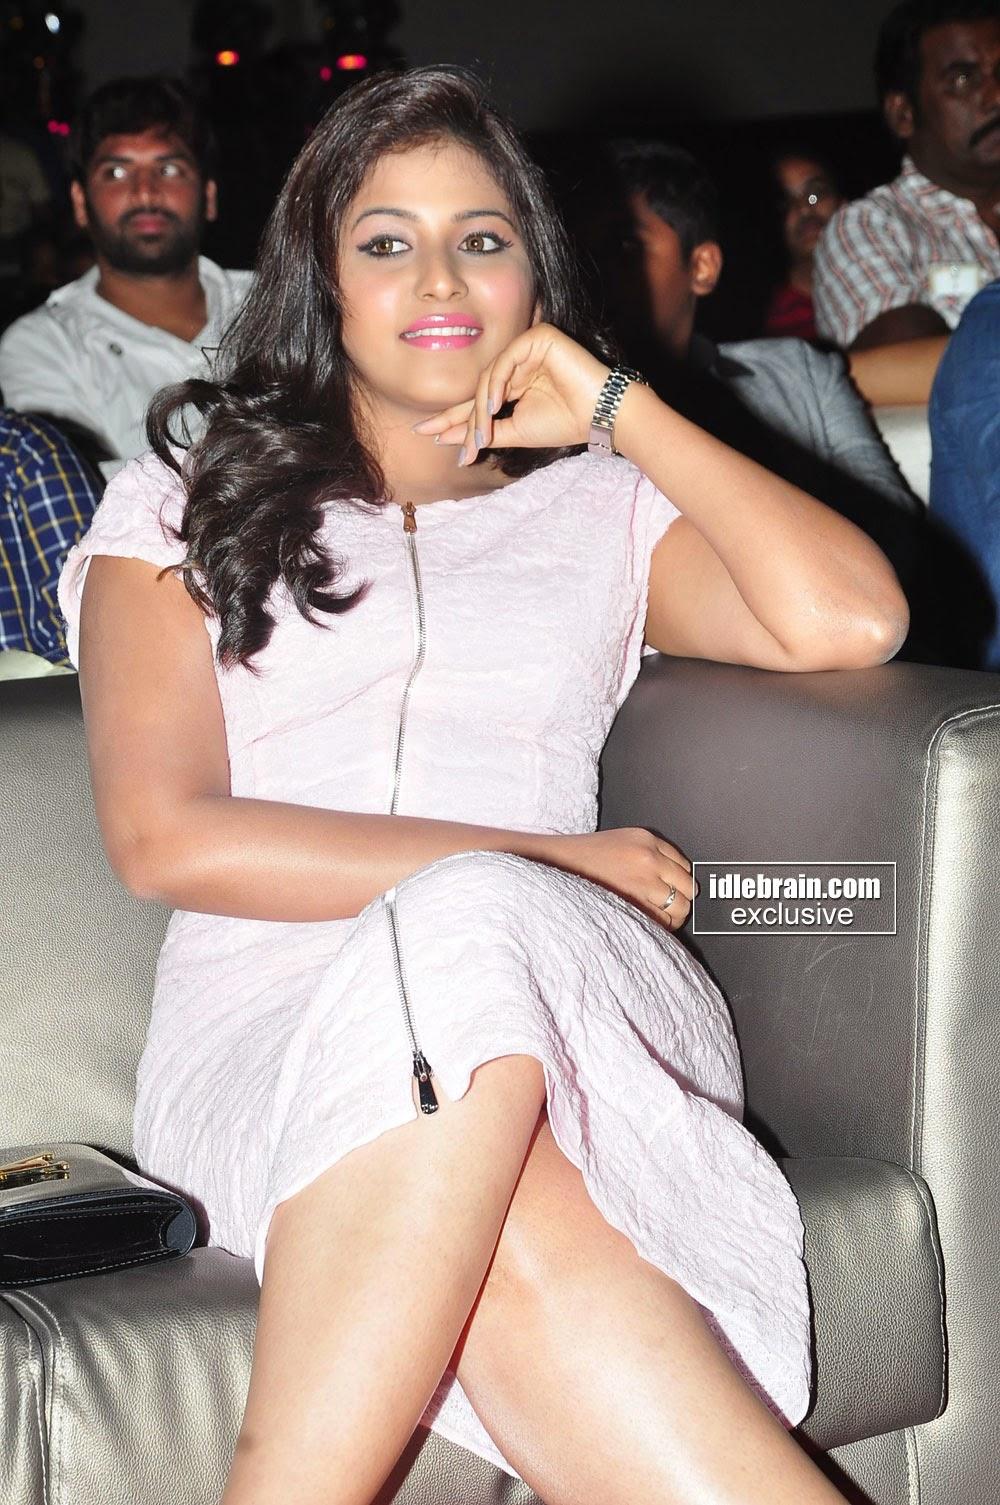 Anjali  crossed legs